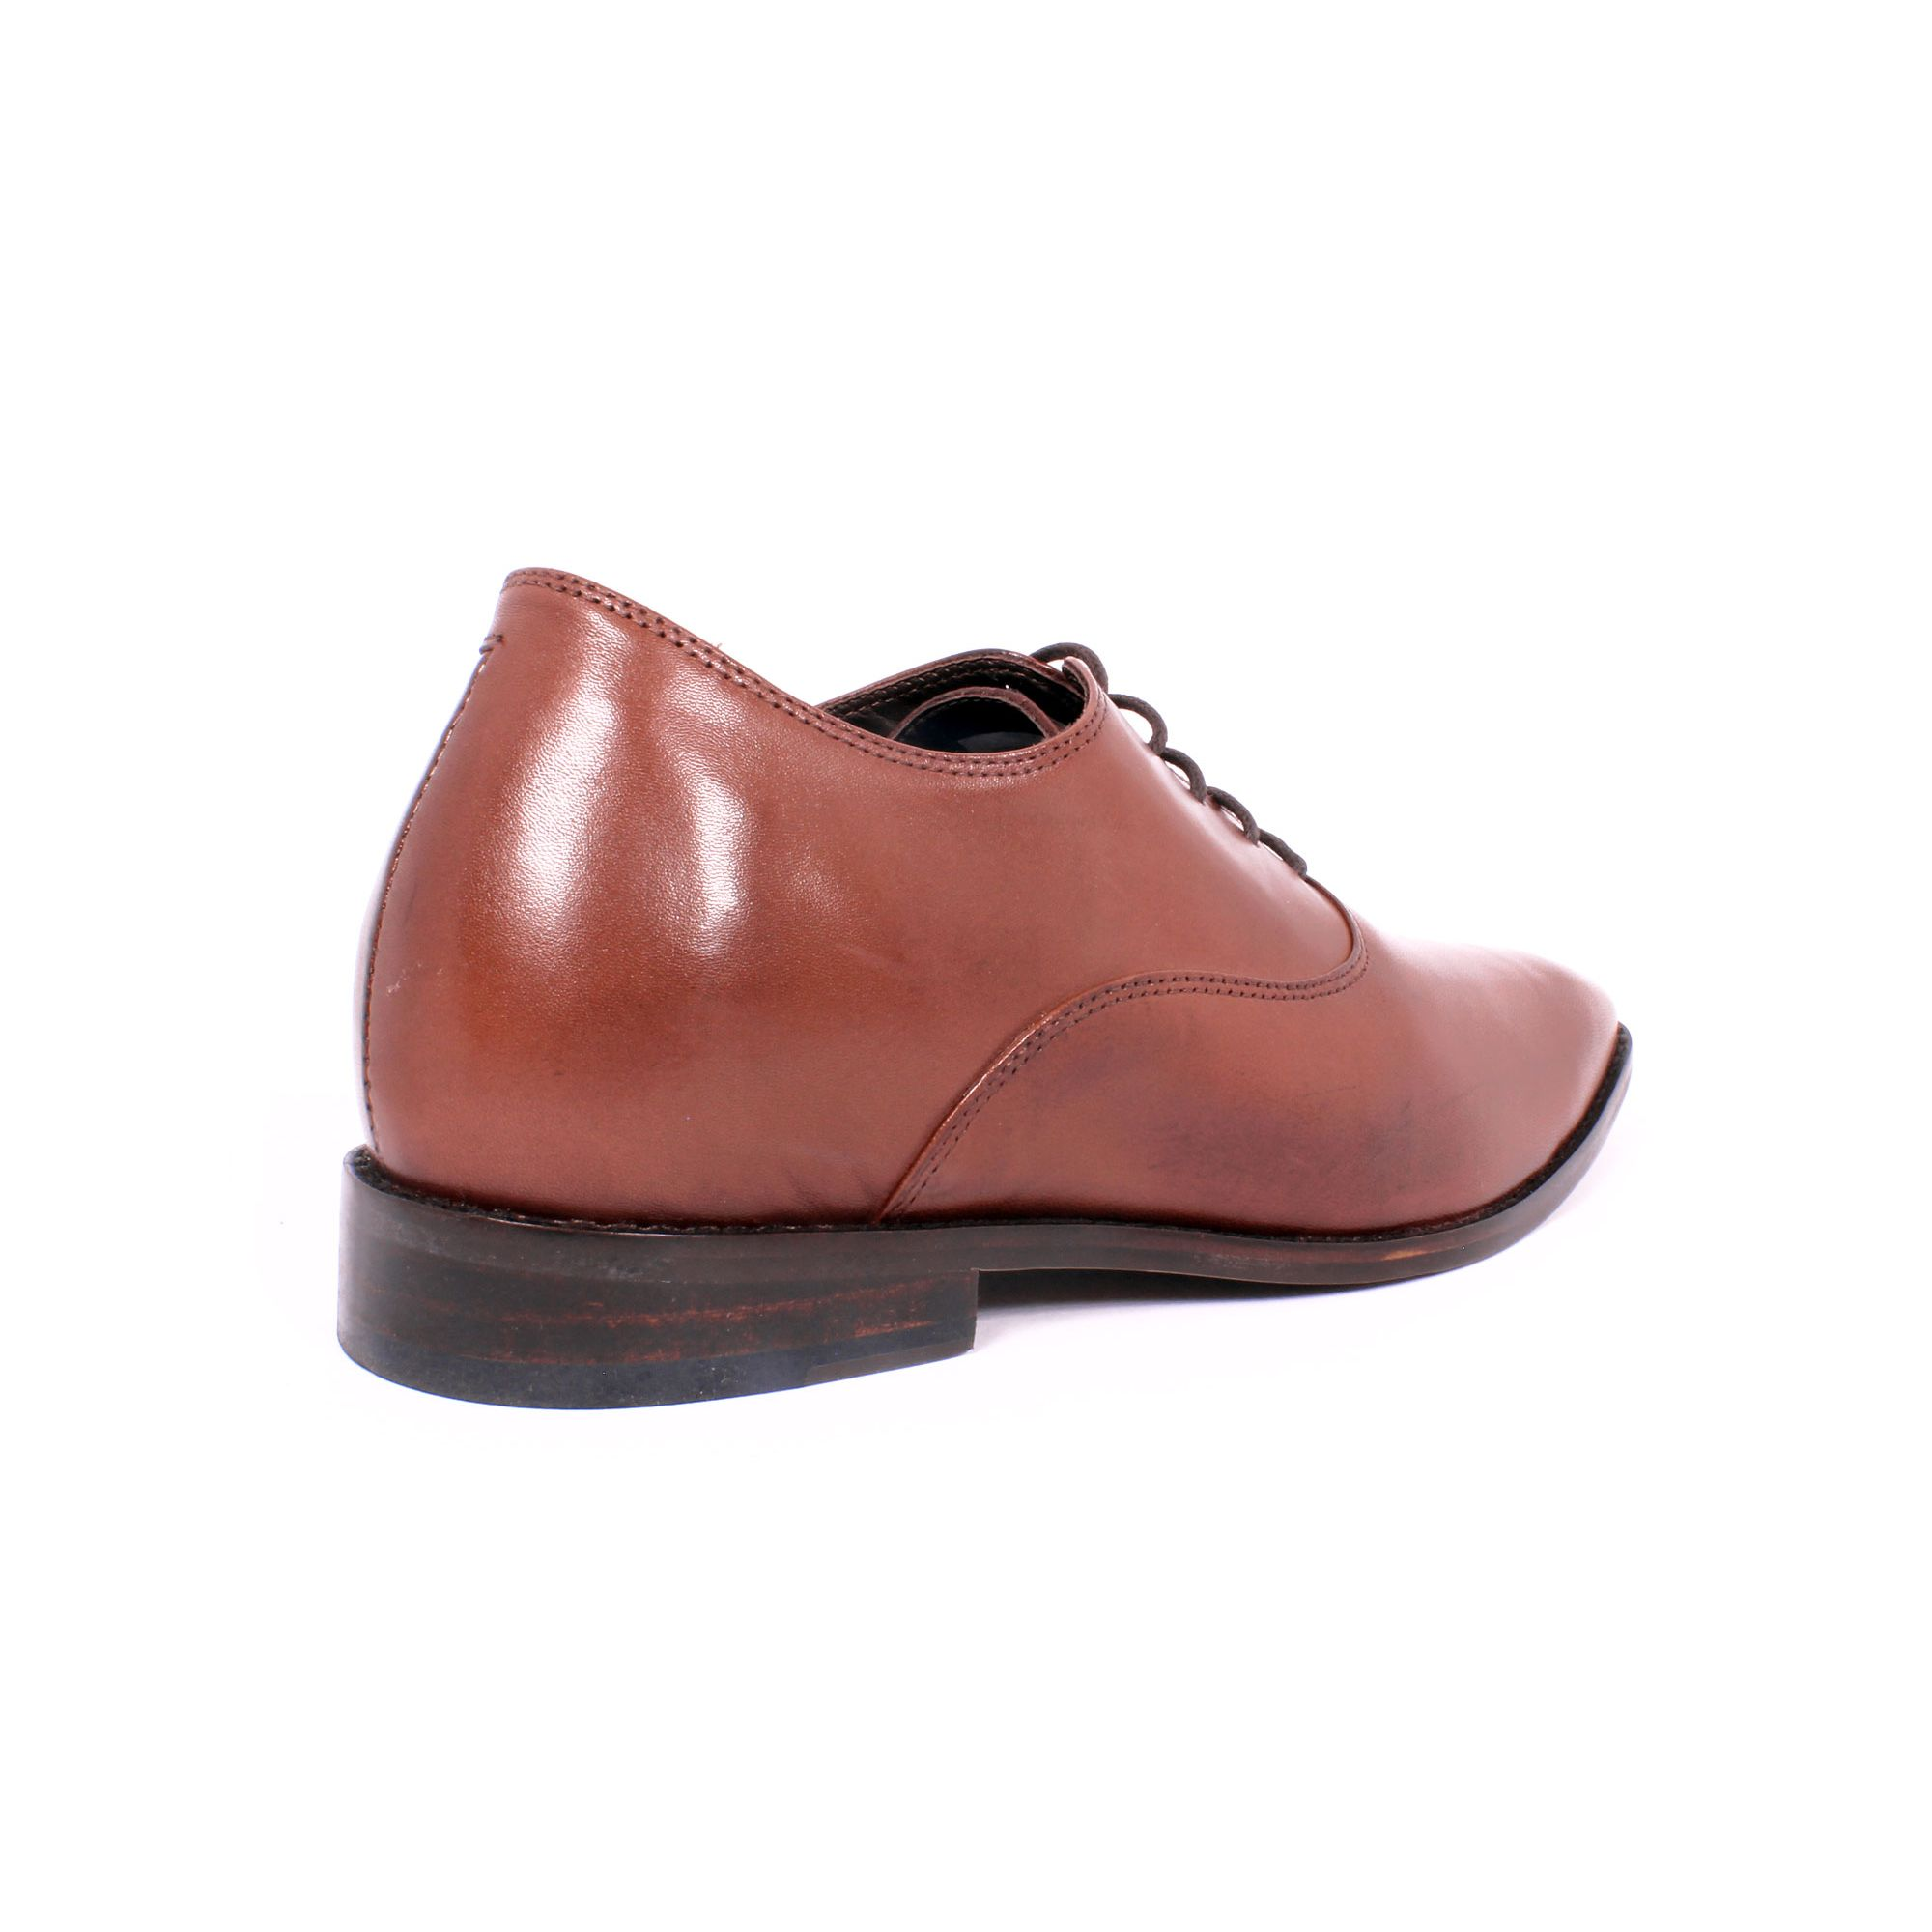 Zapato Formal Elegant Café Max Denegri +7cms de Altura_70804